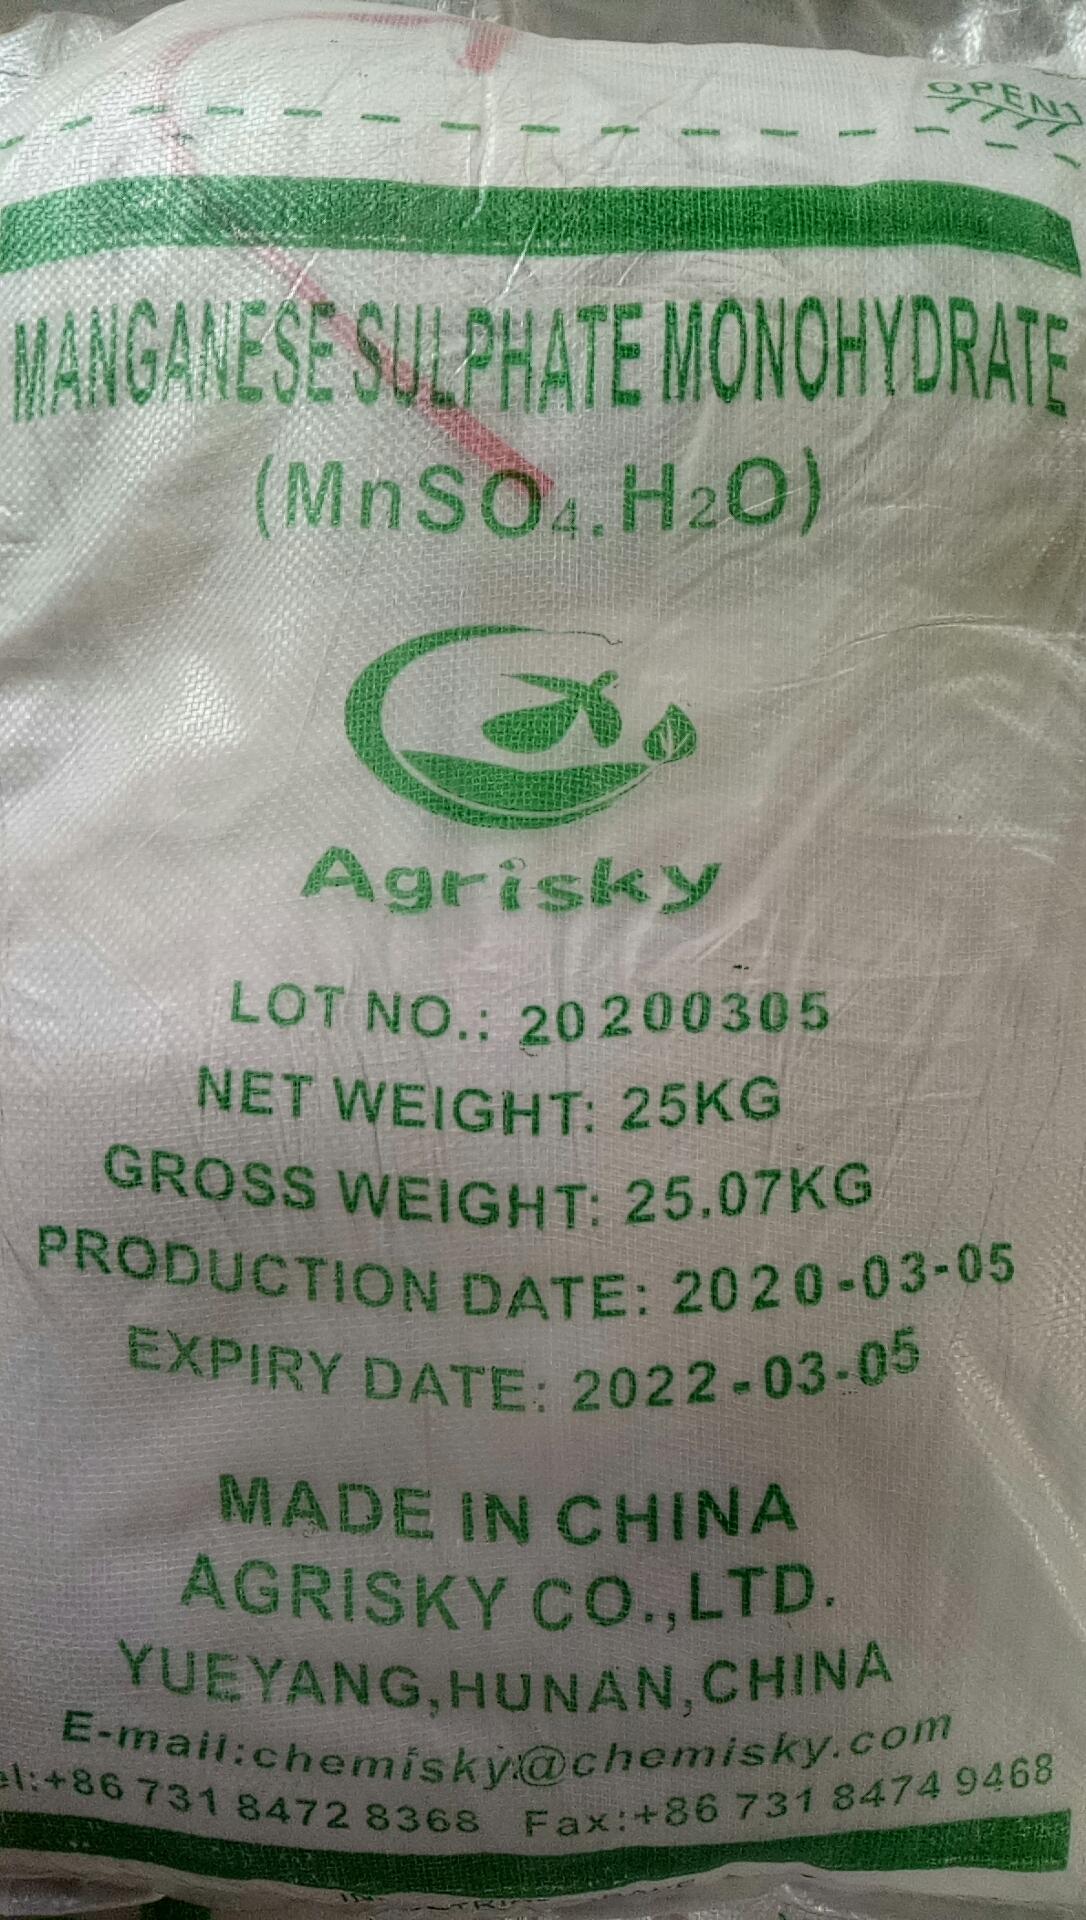 Manganese Sulphate Monohydrate powder (MnSO4.1H2O)